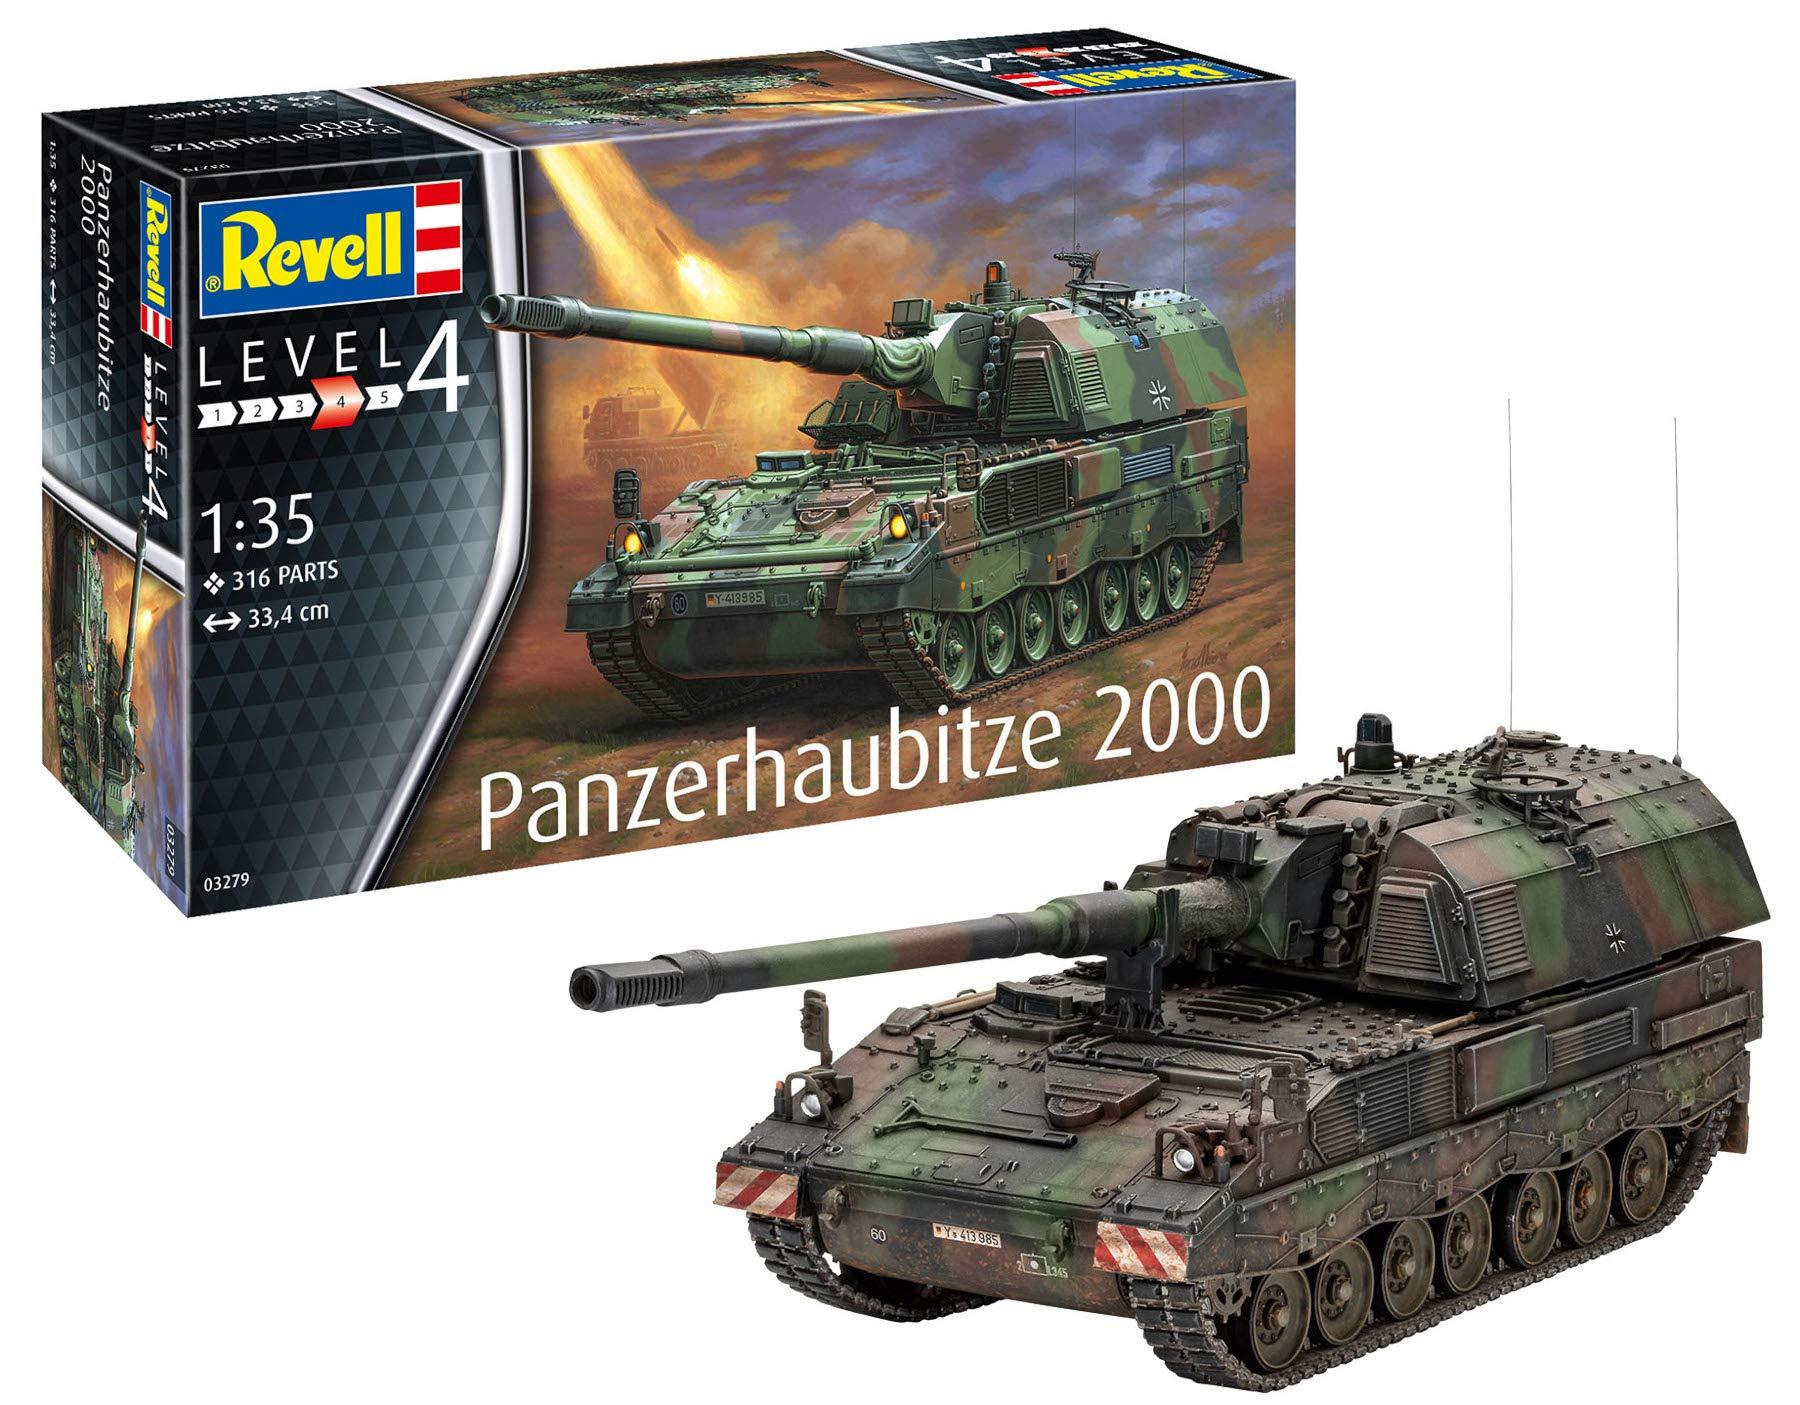 Revell 03279Panzerhaubitze 2000, 1:35 Scale Plastic Model kit